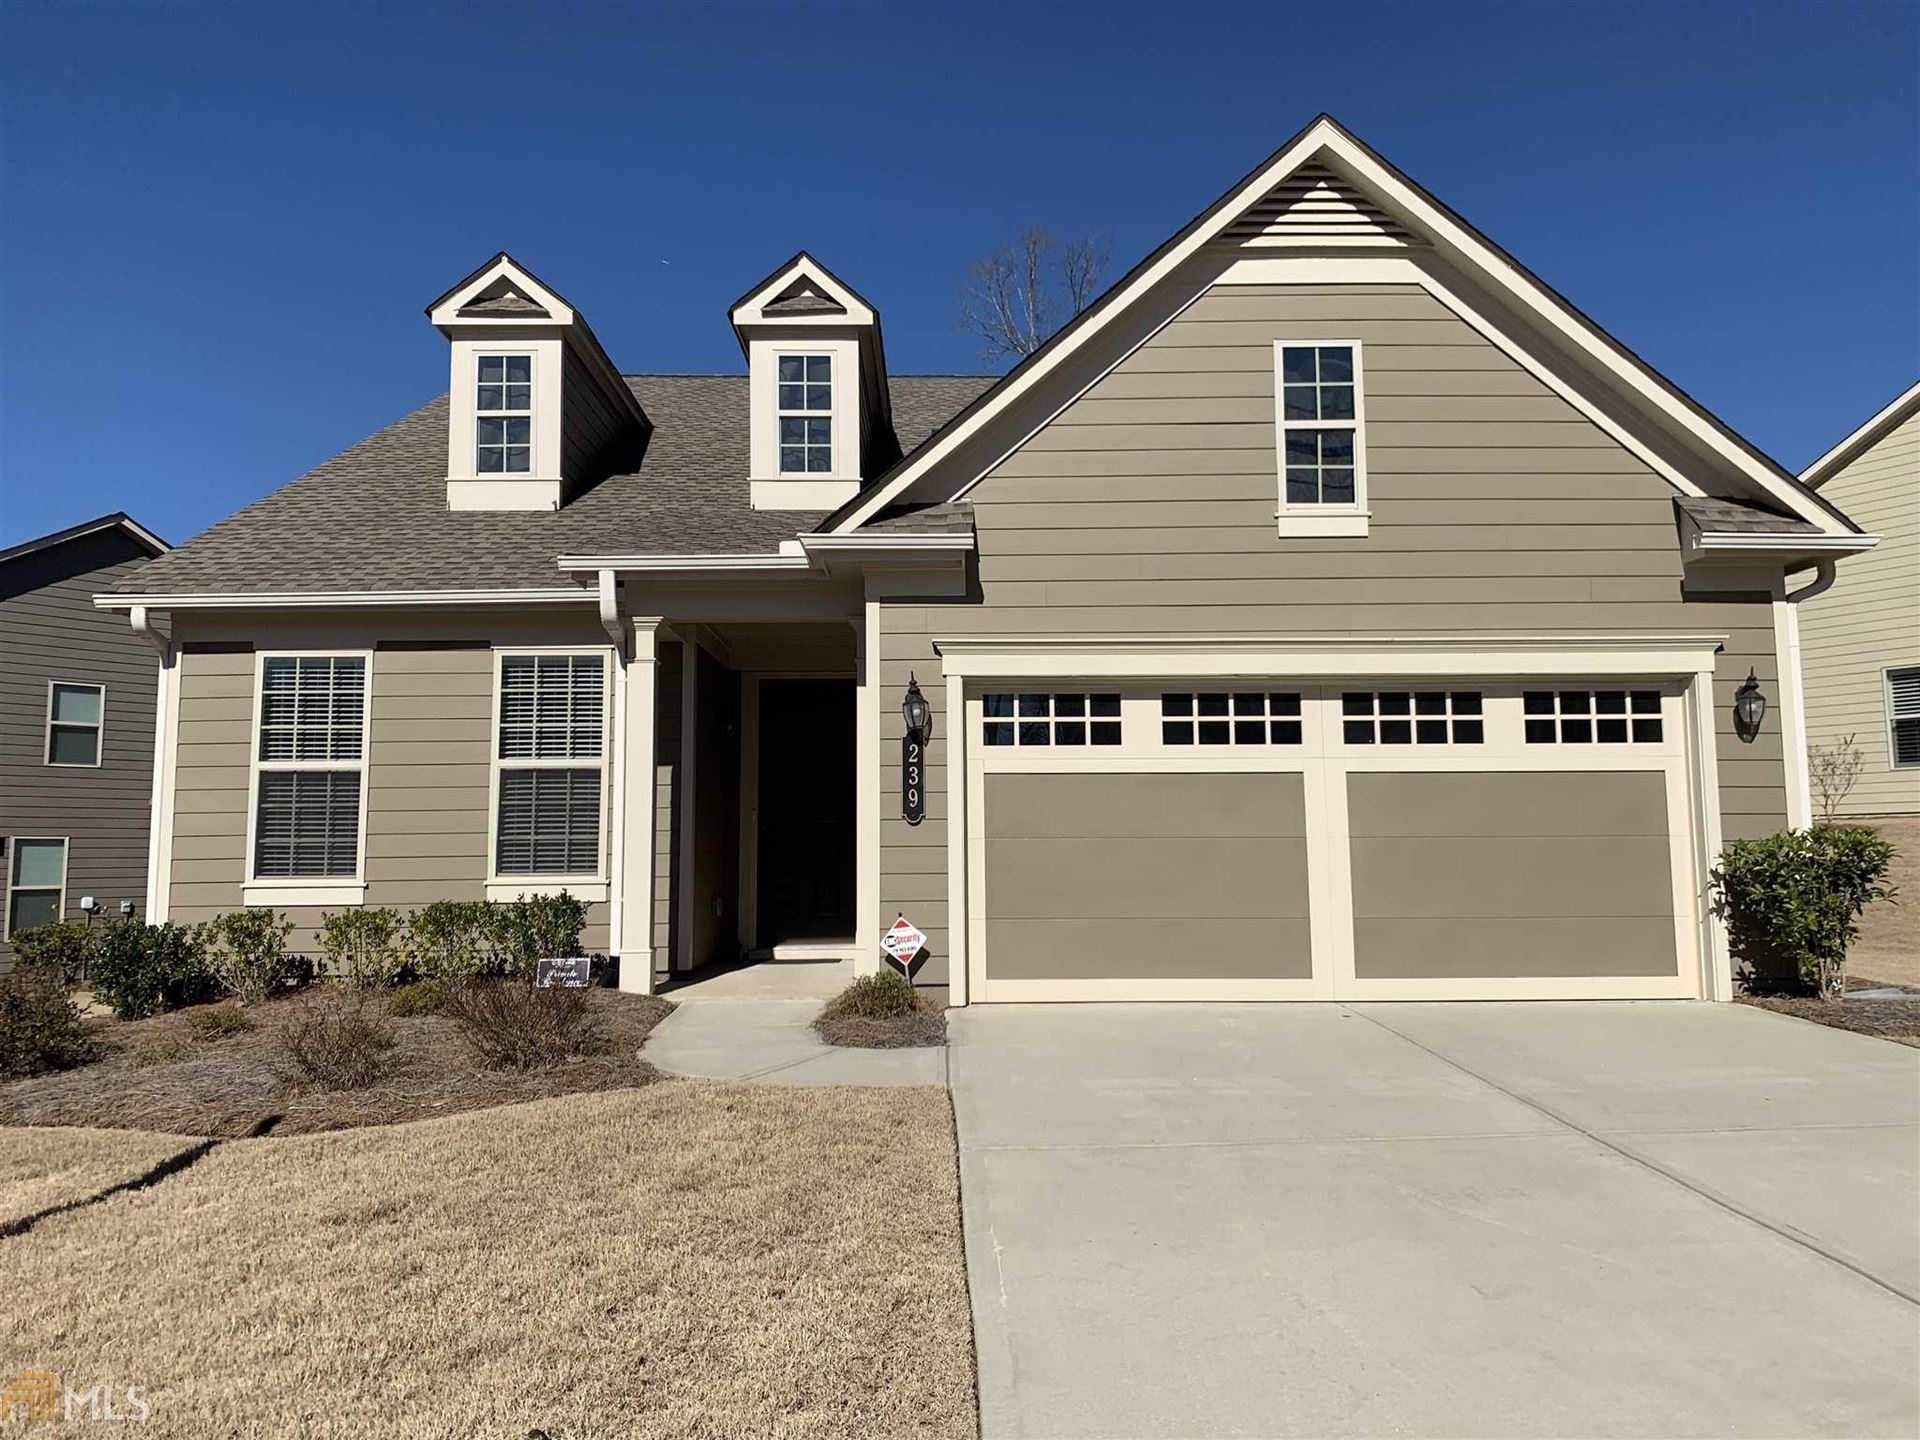 239 Spruce Pine, Peachtree City, GA 30269 - MLS#: 8916620